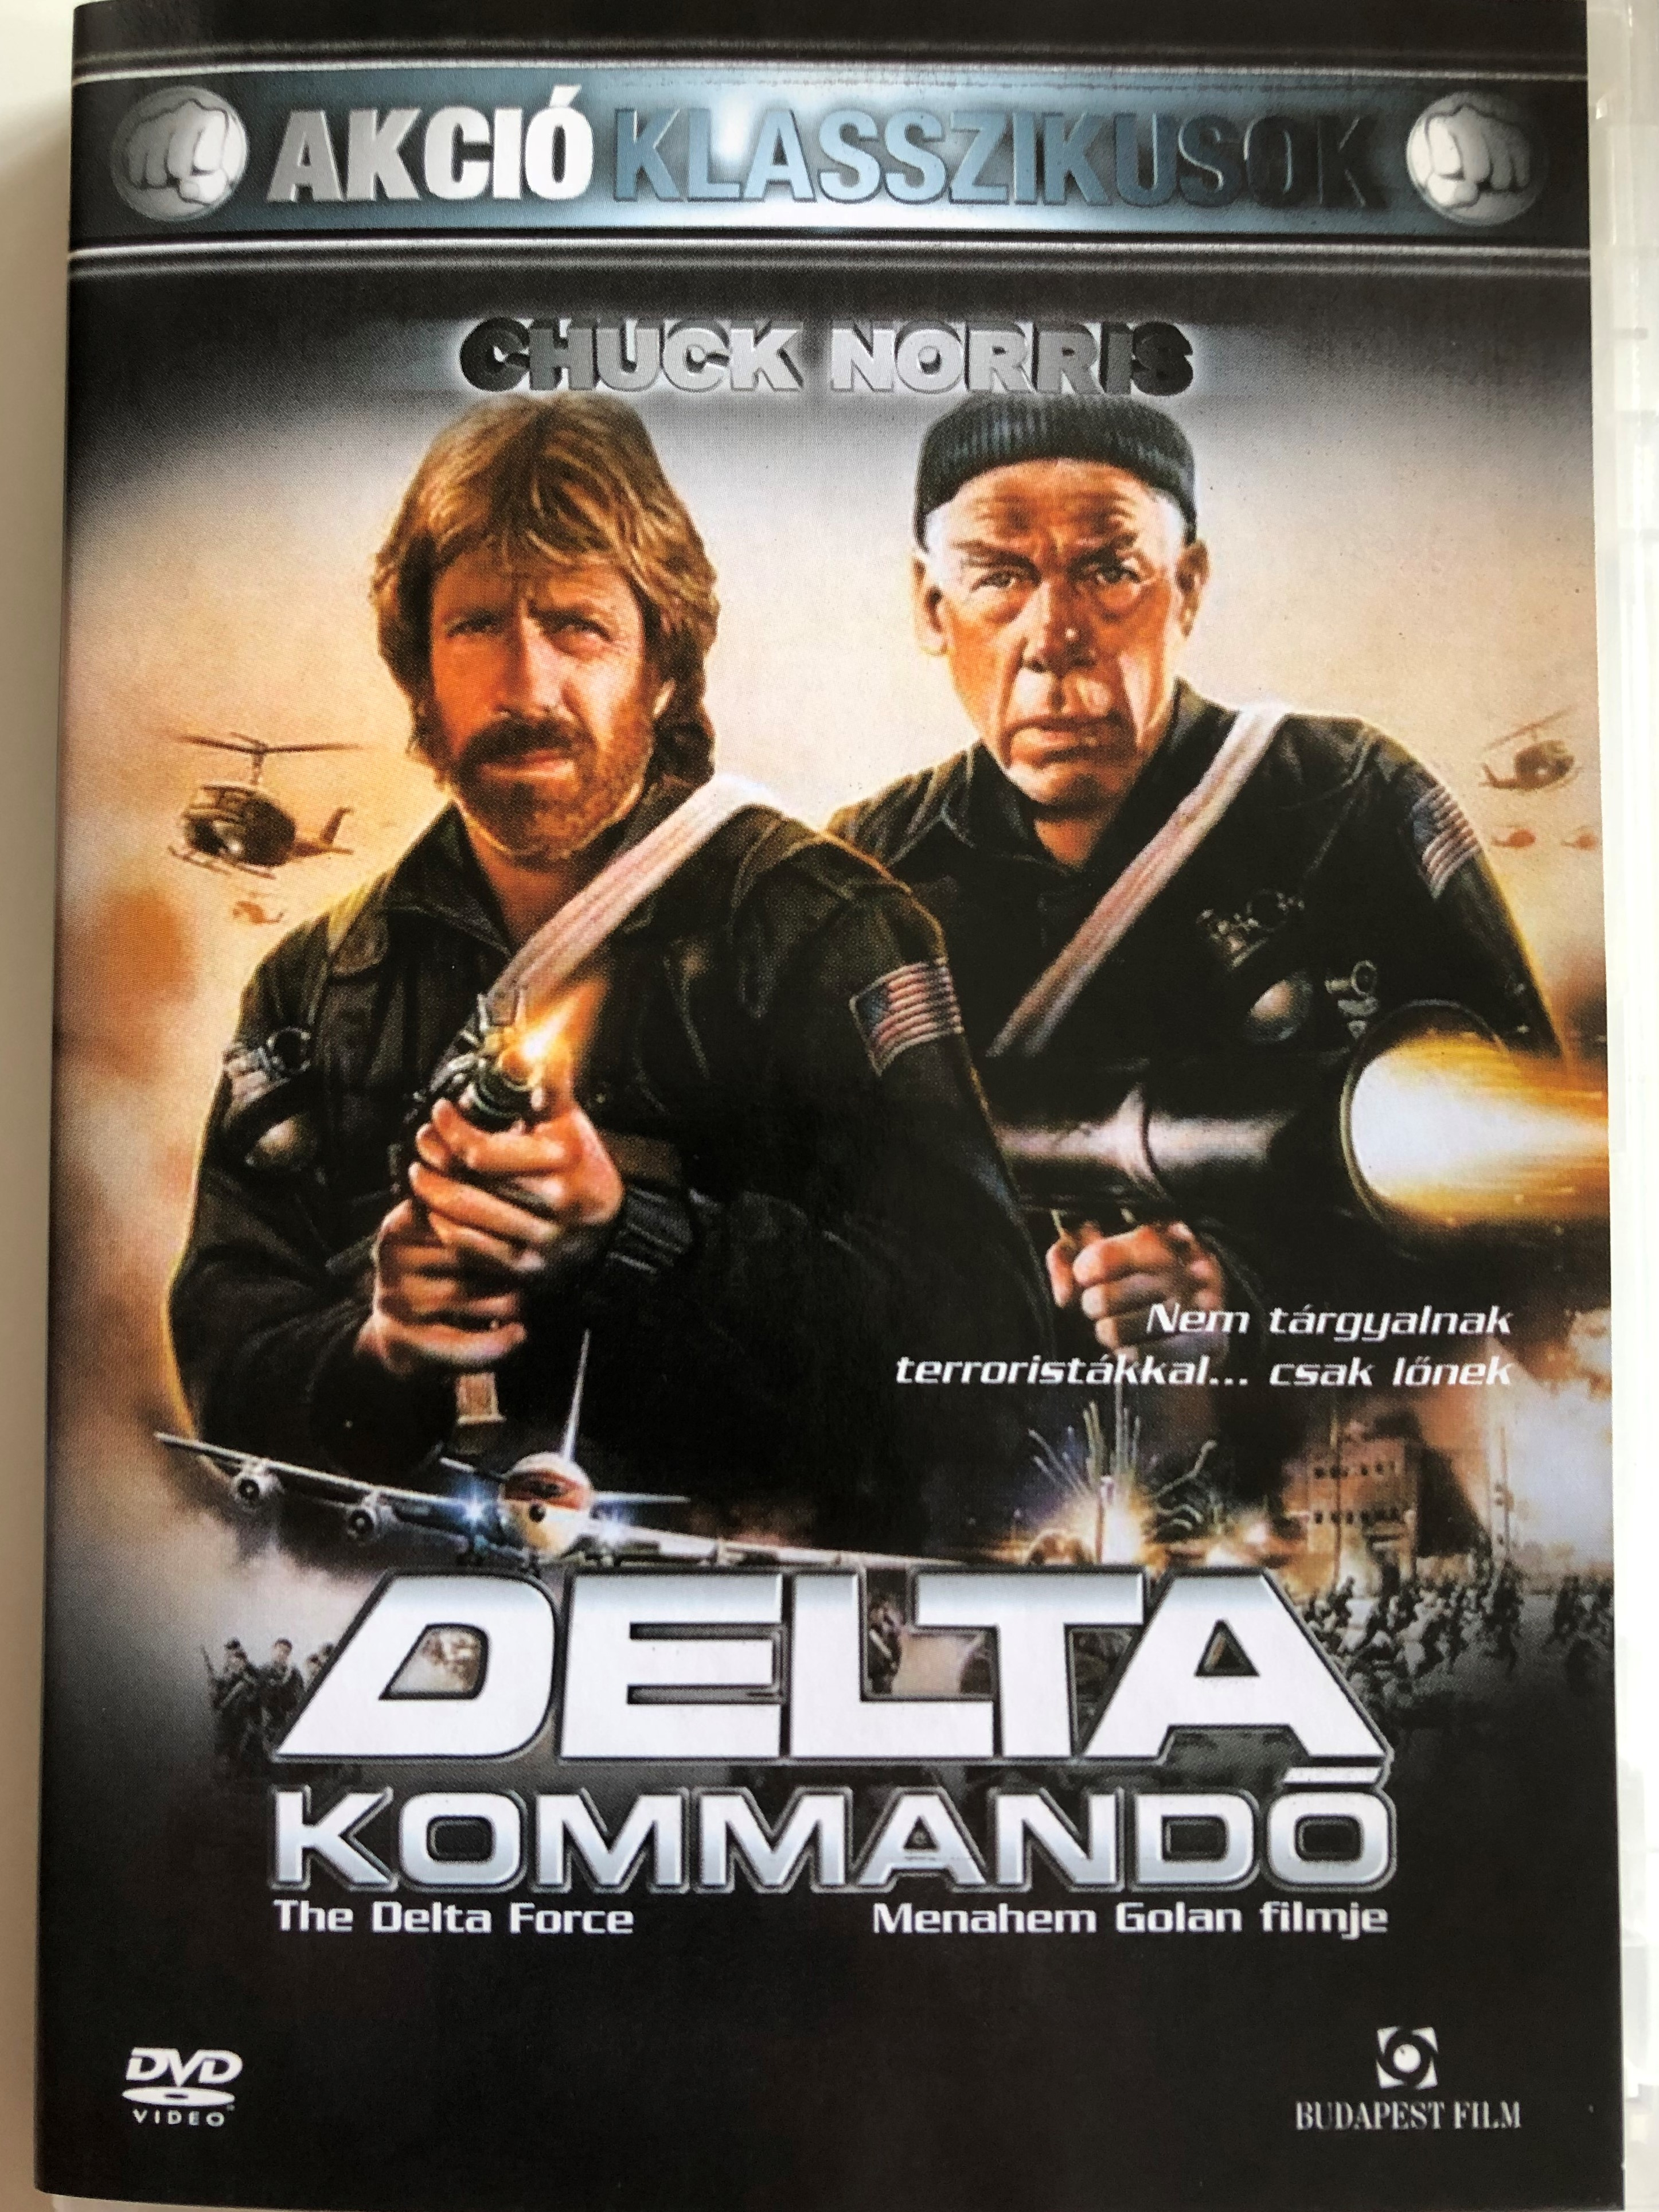 the-delta-force-dvd-1986-delta-kommand-directed-by-menahem-golan-1.jpg